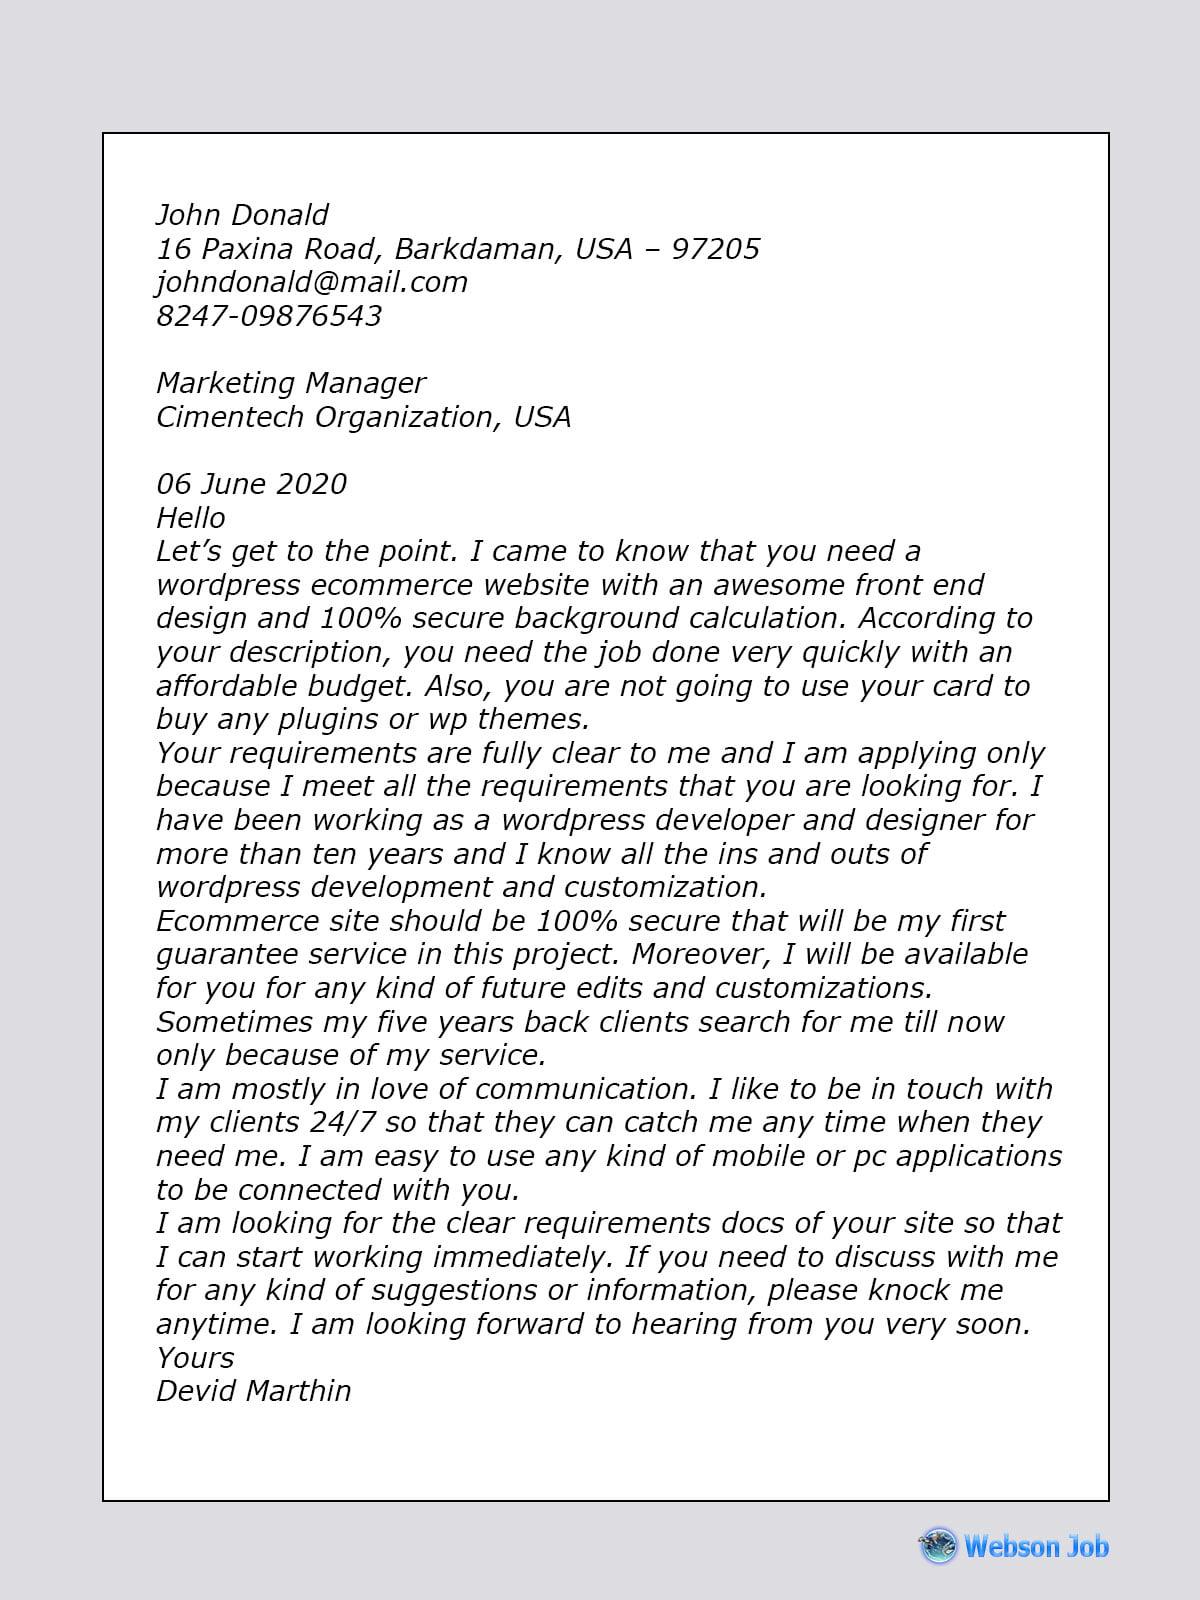 wordpress developer cover letter sample  example and format